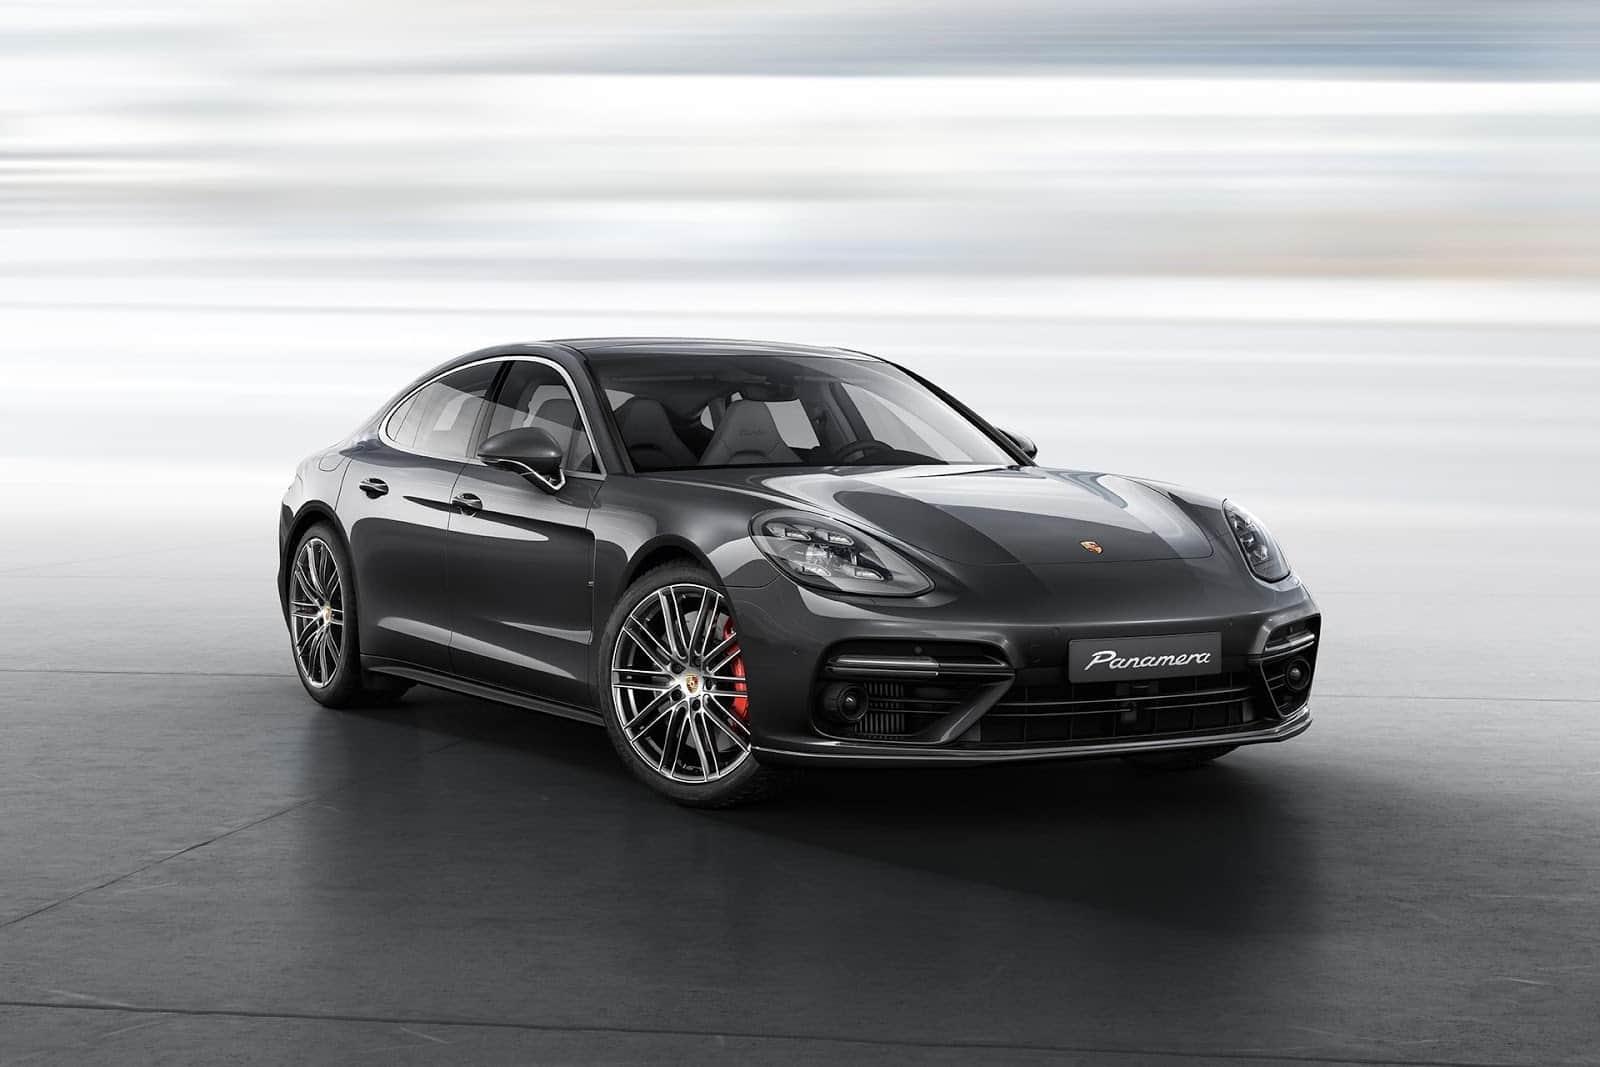 The 2017 Porsche Panamera Looks Better Than Ever